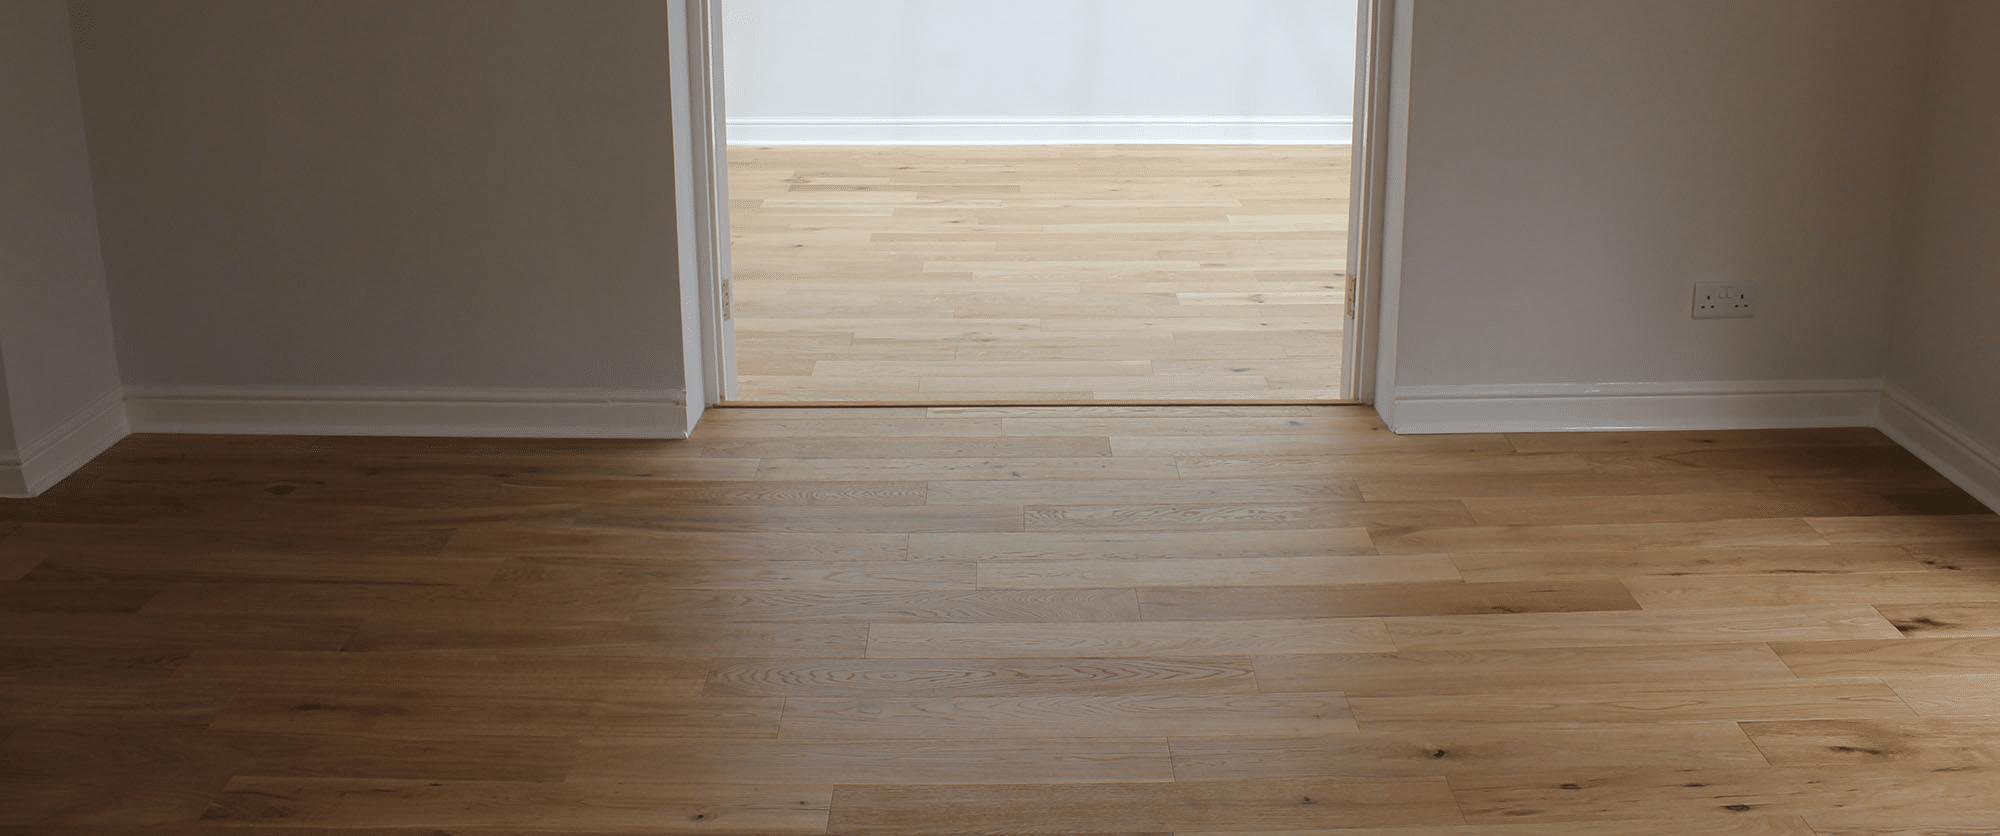 Budget Flooring Special